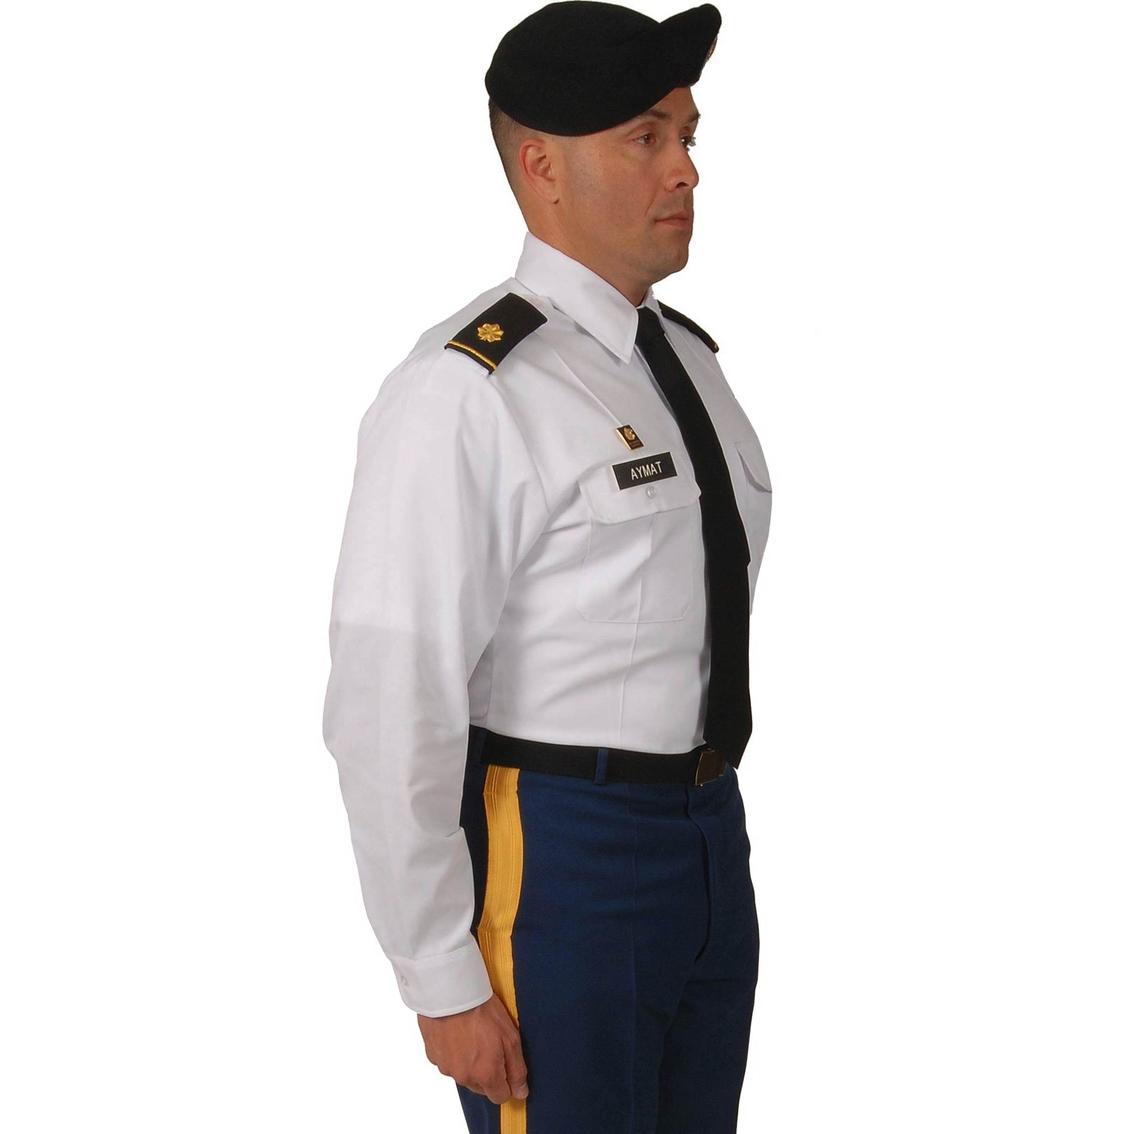 Darwood Tapered Shirt White Asu Shirts Military Shop The